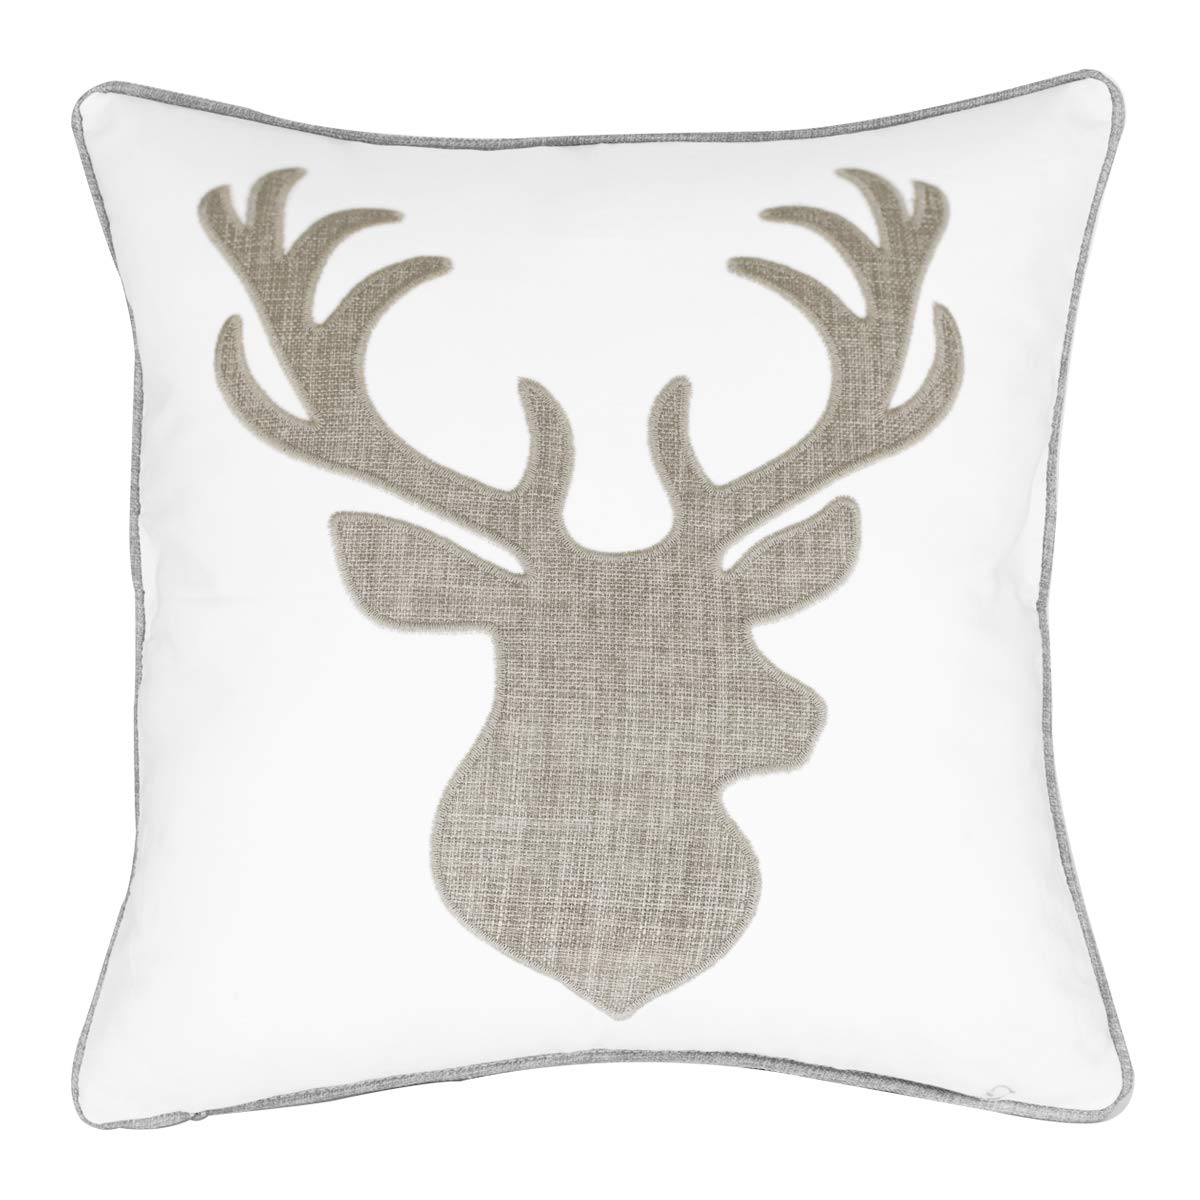 Amazon.com: millianess Funda de almohada de algodón bordada ...